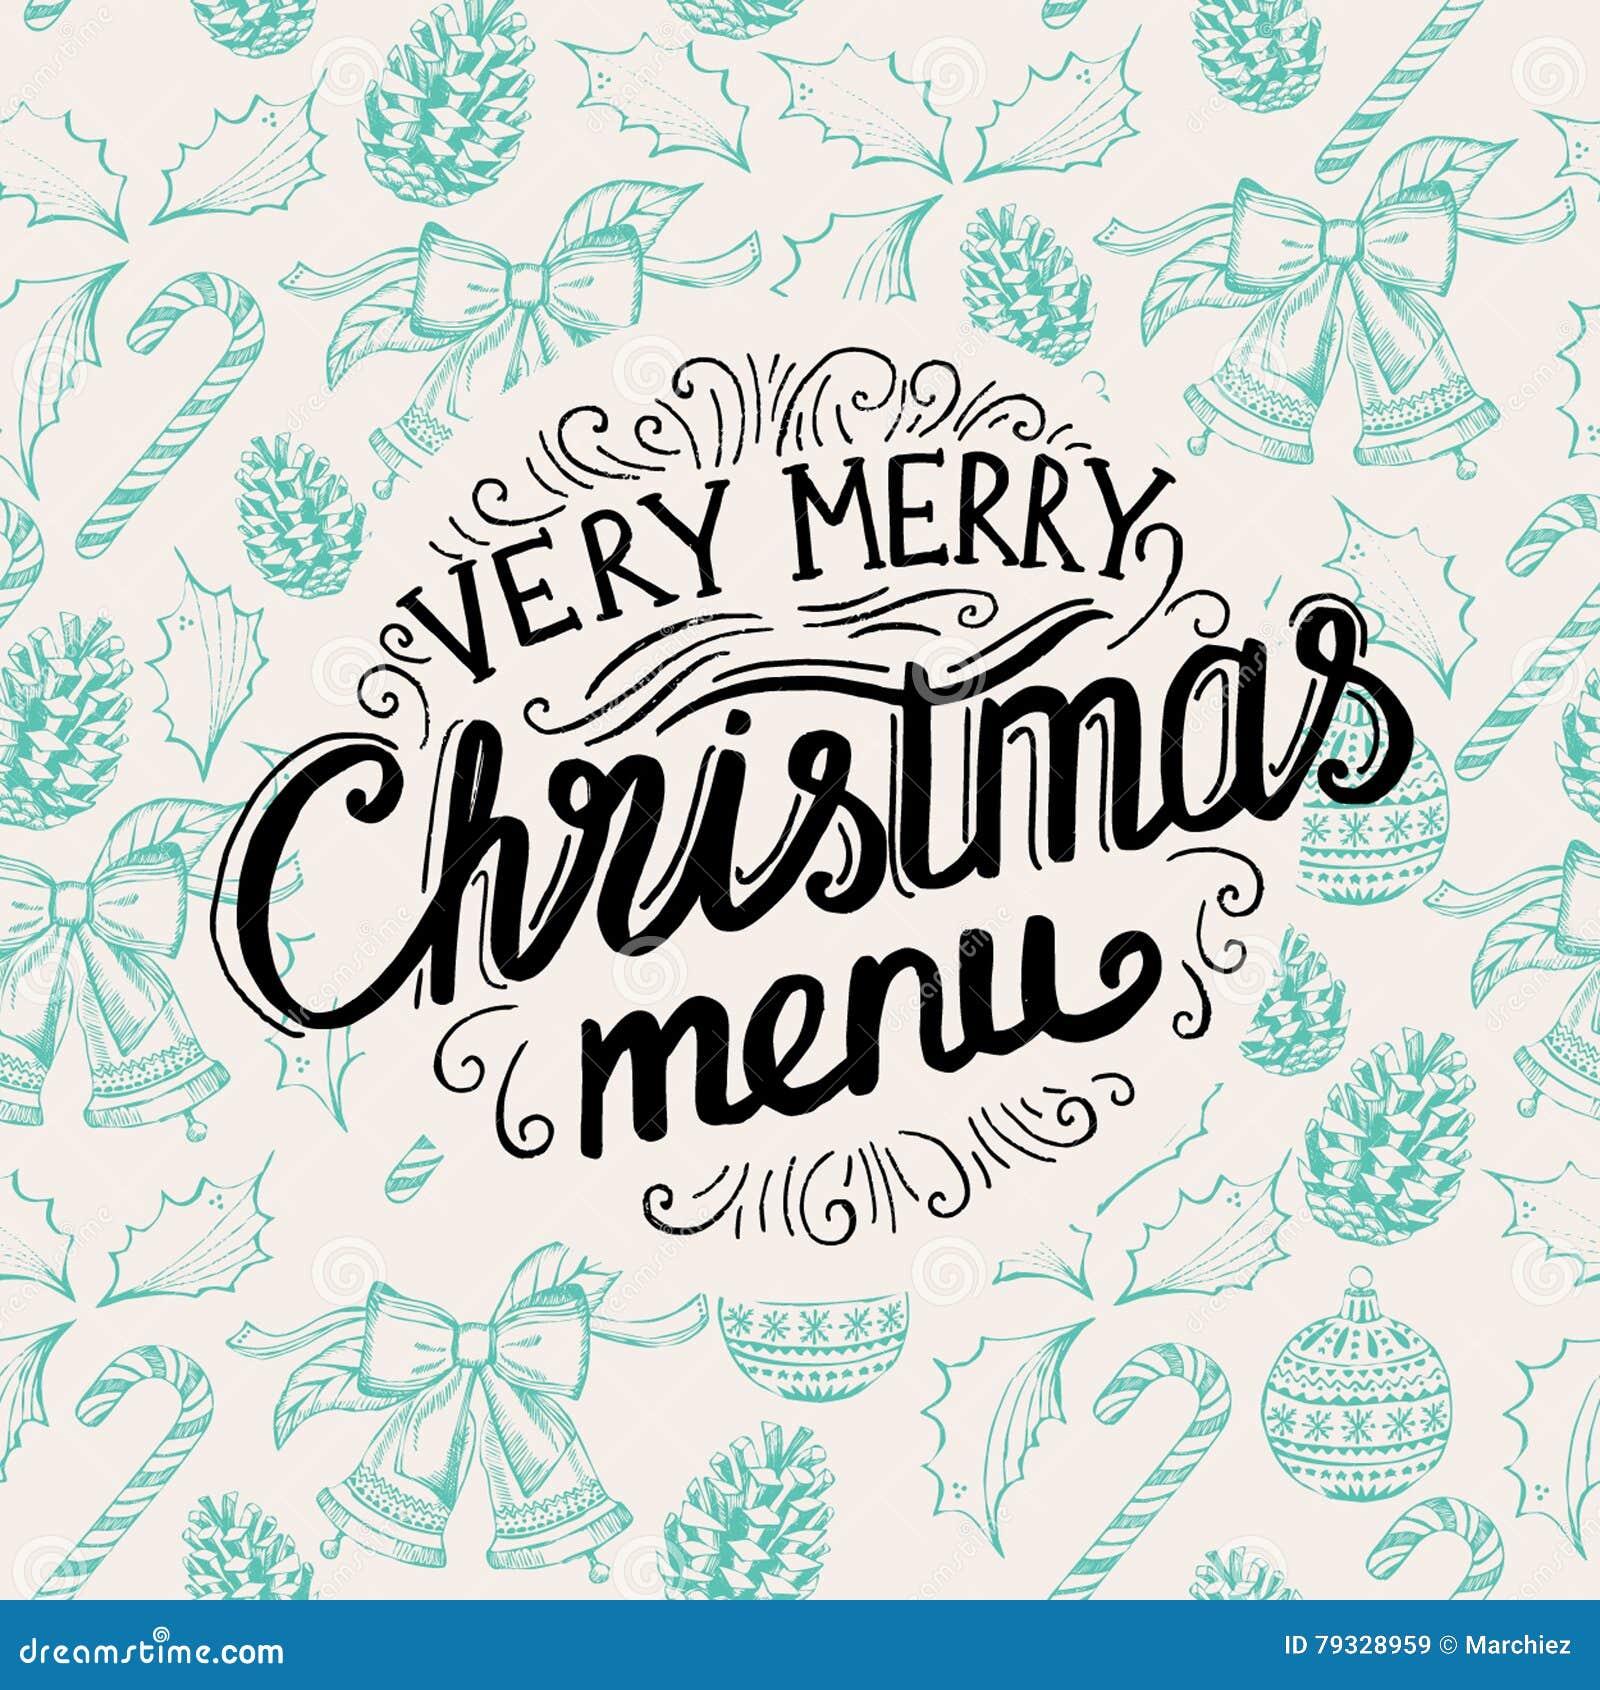 Christmas party invitation food menu restaurant stock vector christmas party invitation food menu restaurant happy layout stopboris Images